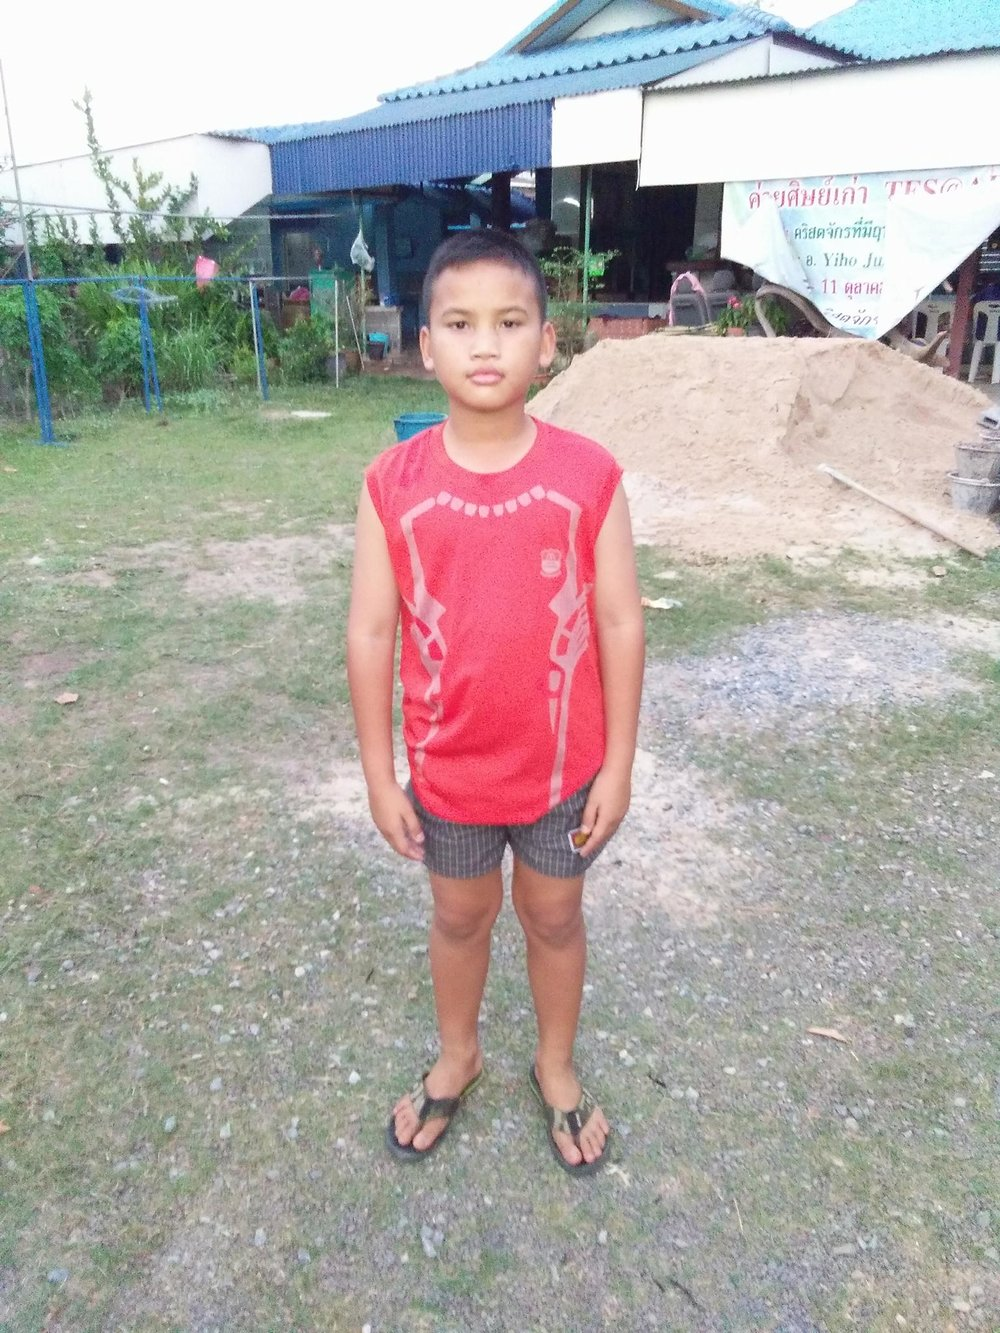 Phai (9 years old, boy)